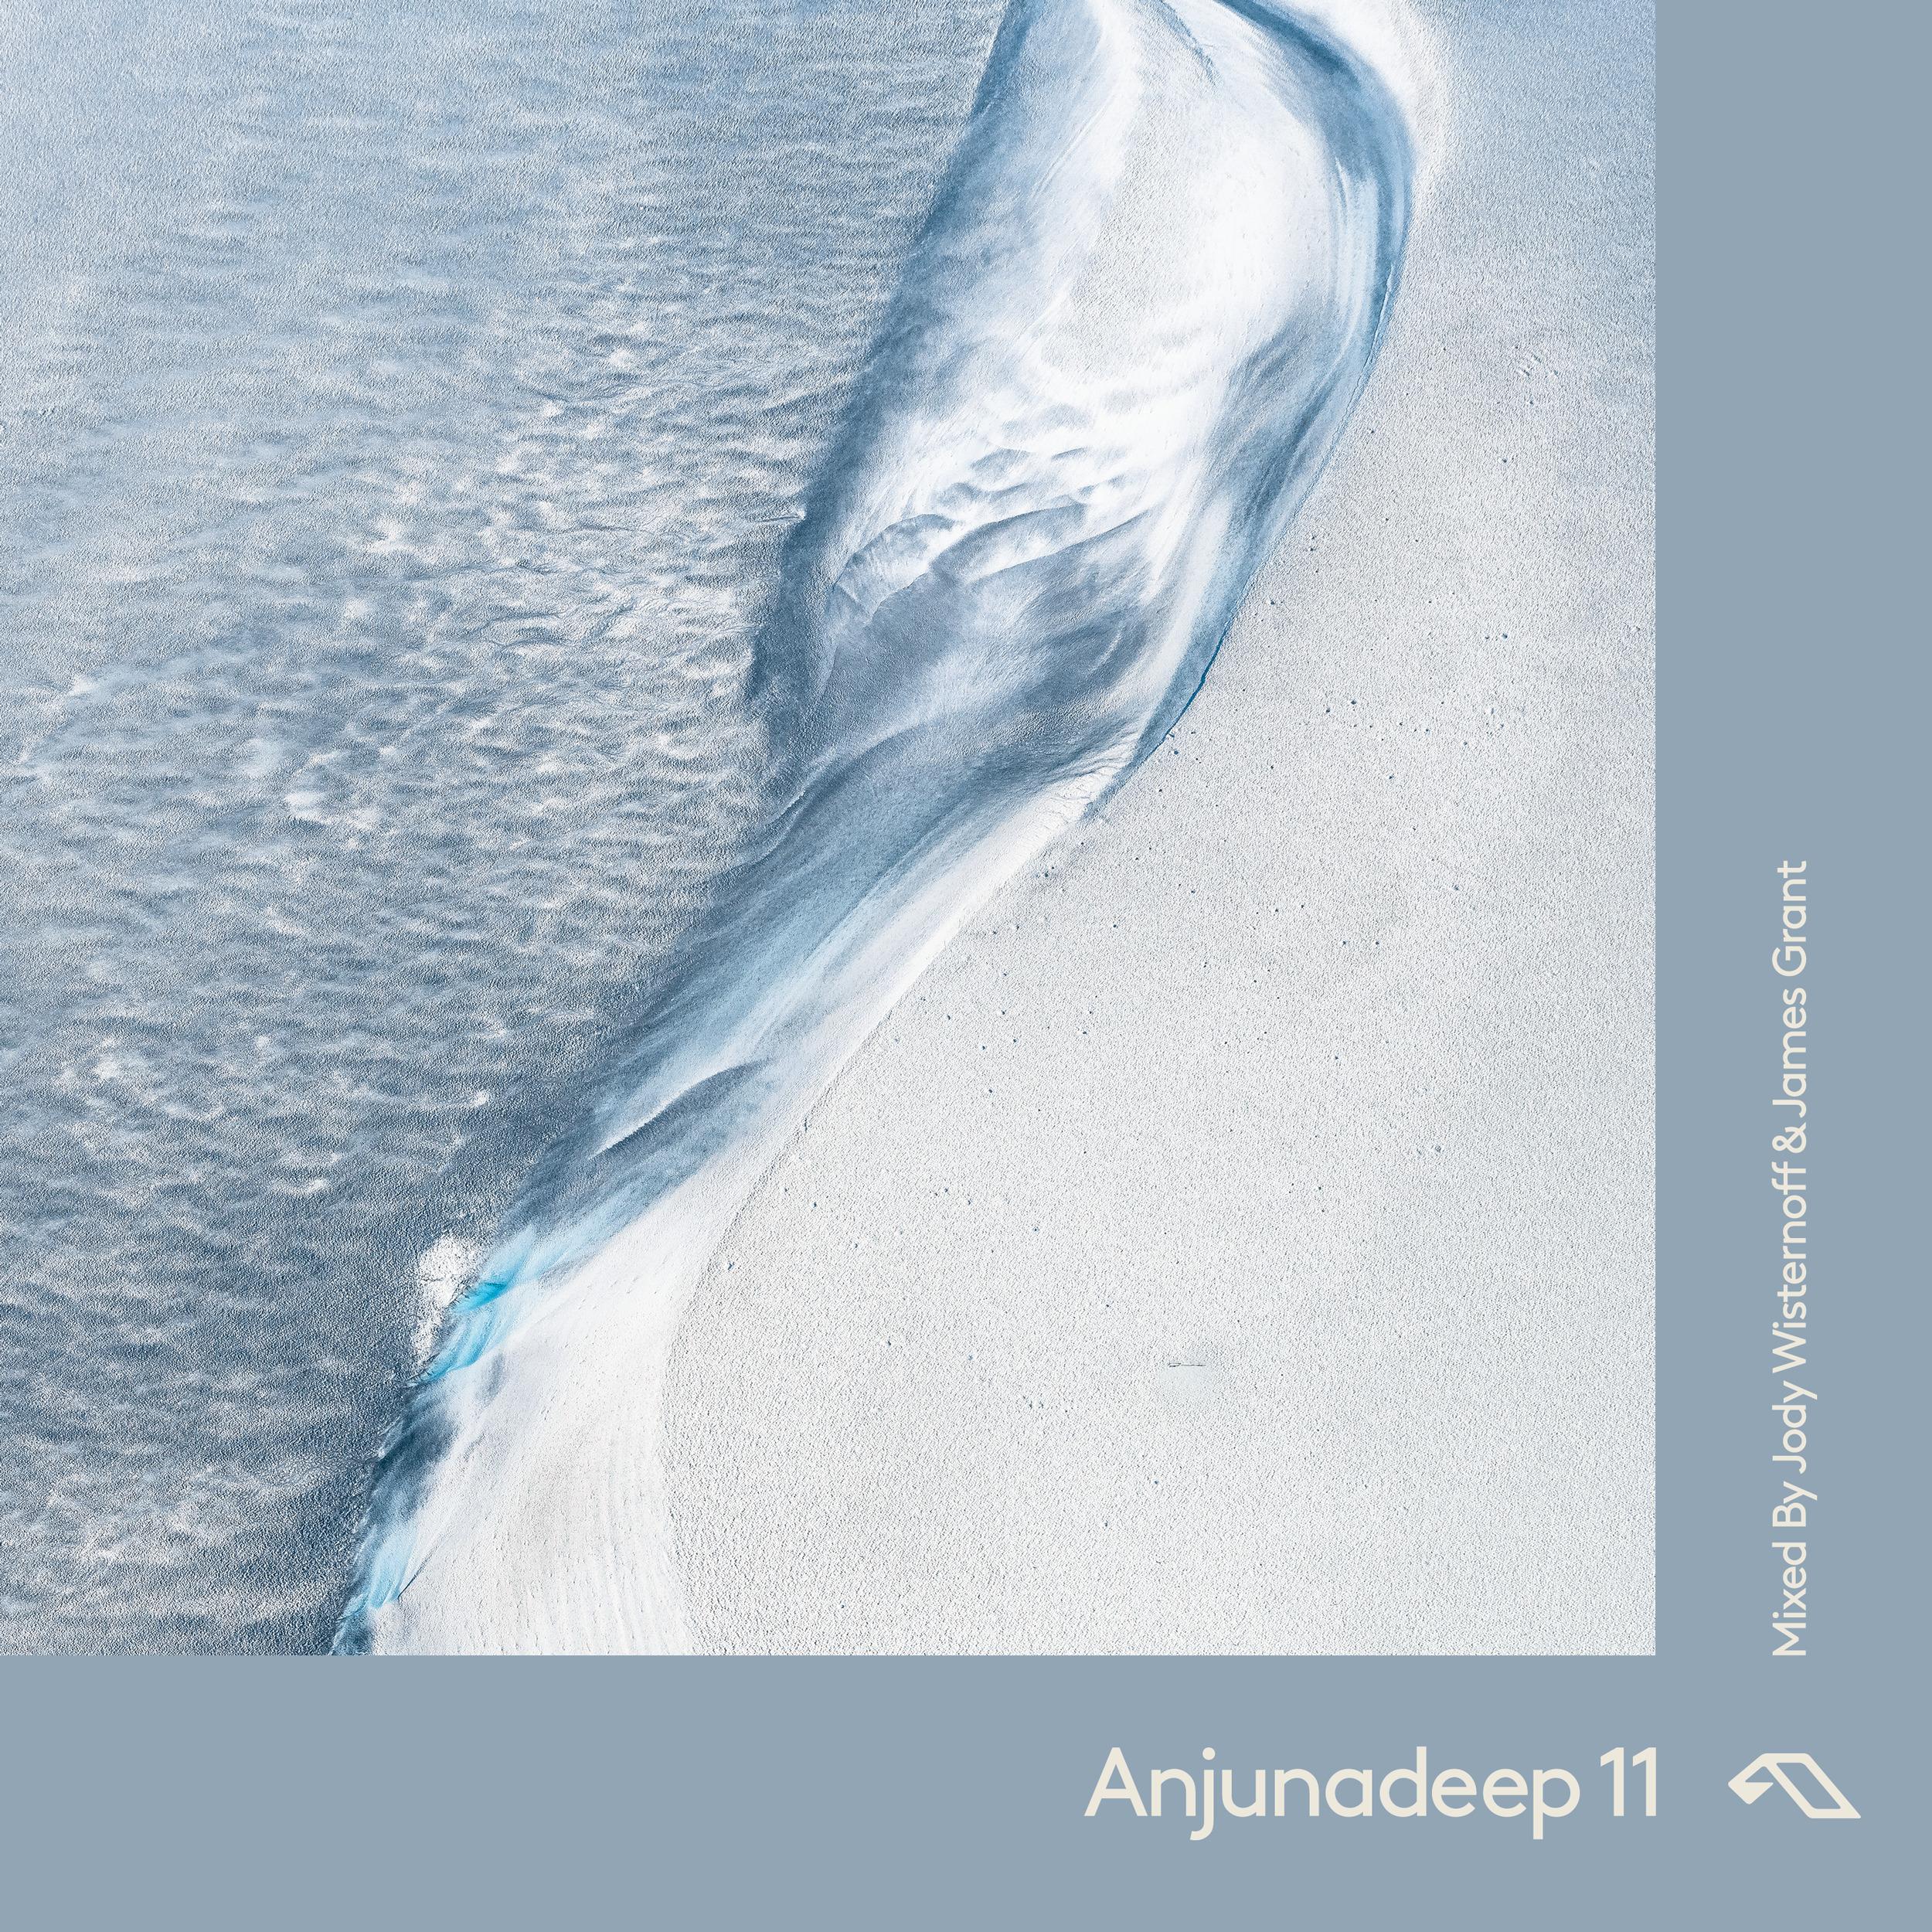 Anjunadeep 11 (2020)